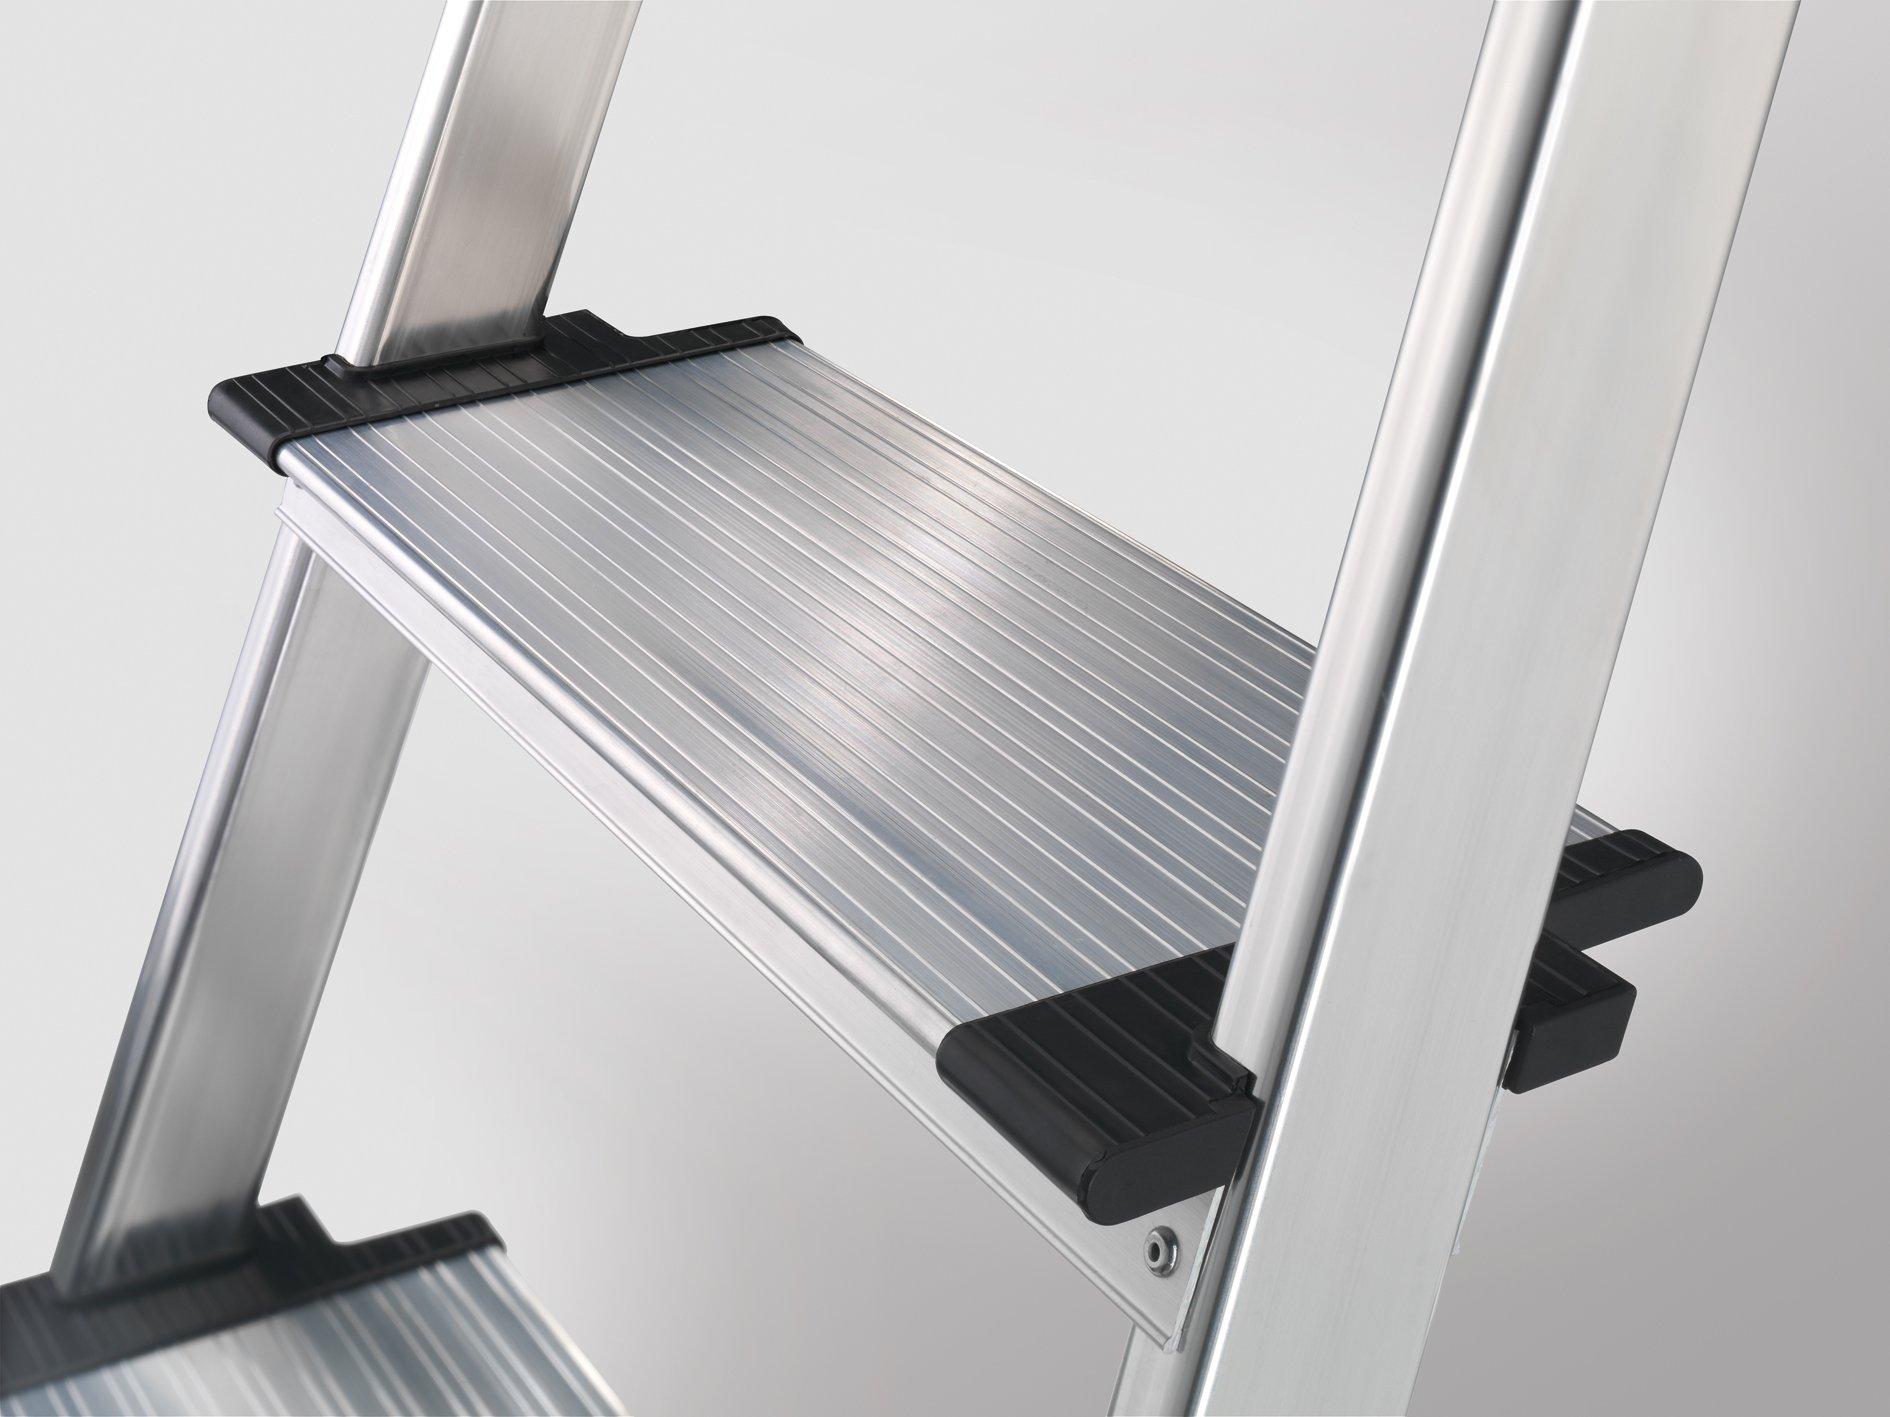 Hailo 8030-627 XXR Comfortline 6Step Folding Lightweight Aluminum Step Ladder with Worktray Silver